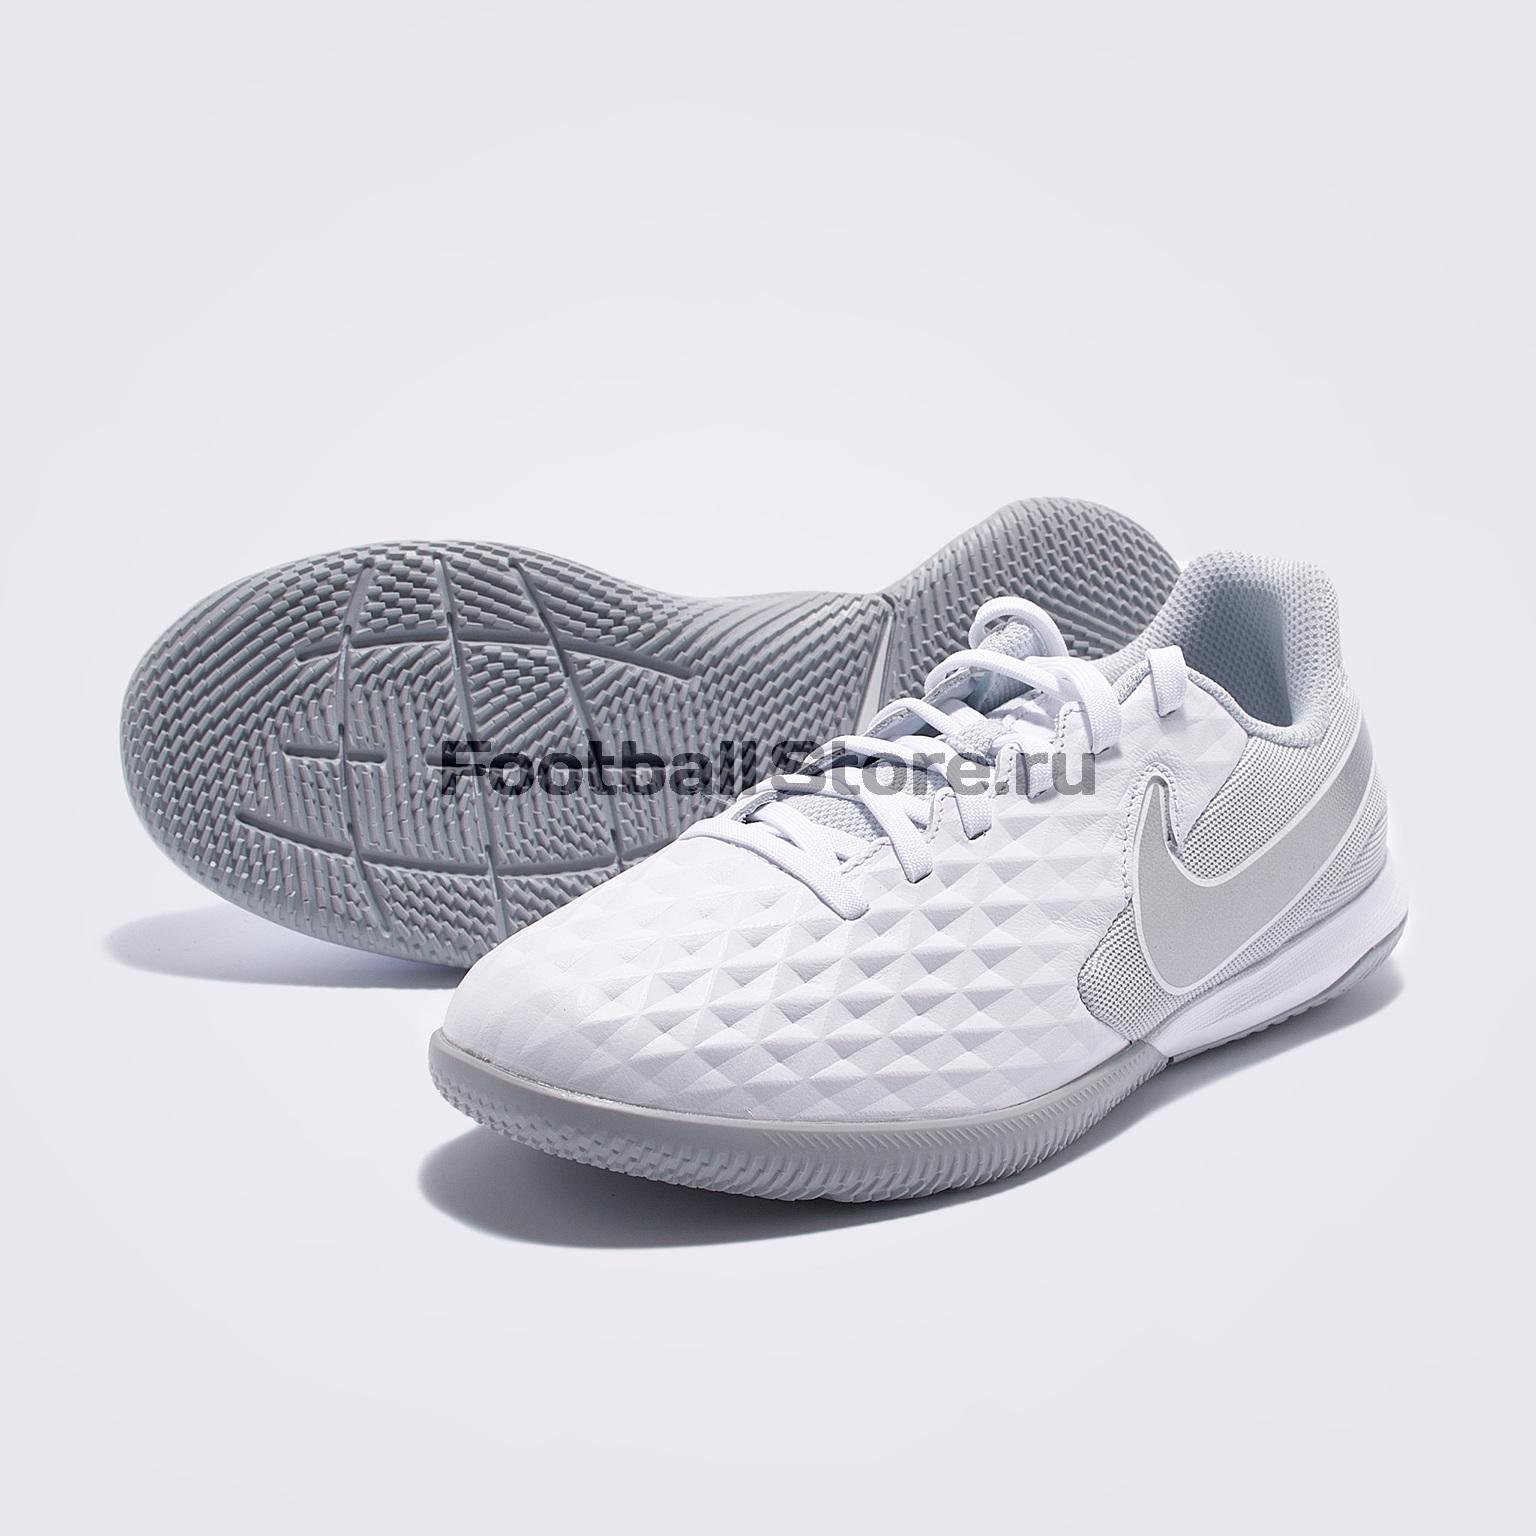 Футзалки детские Nike Legend 8 Academy IC AT5735-100 цена и фото